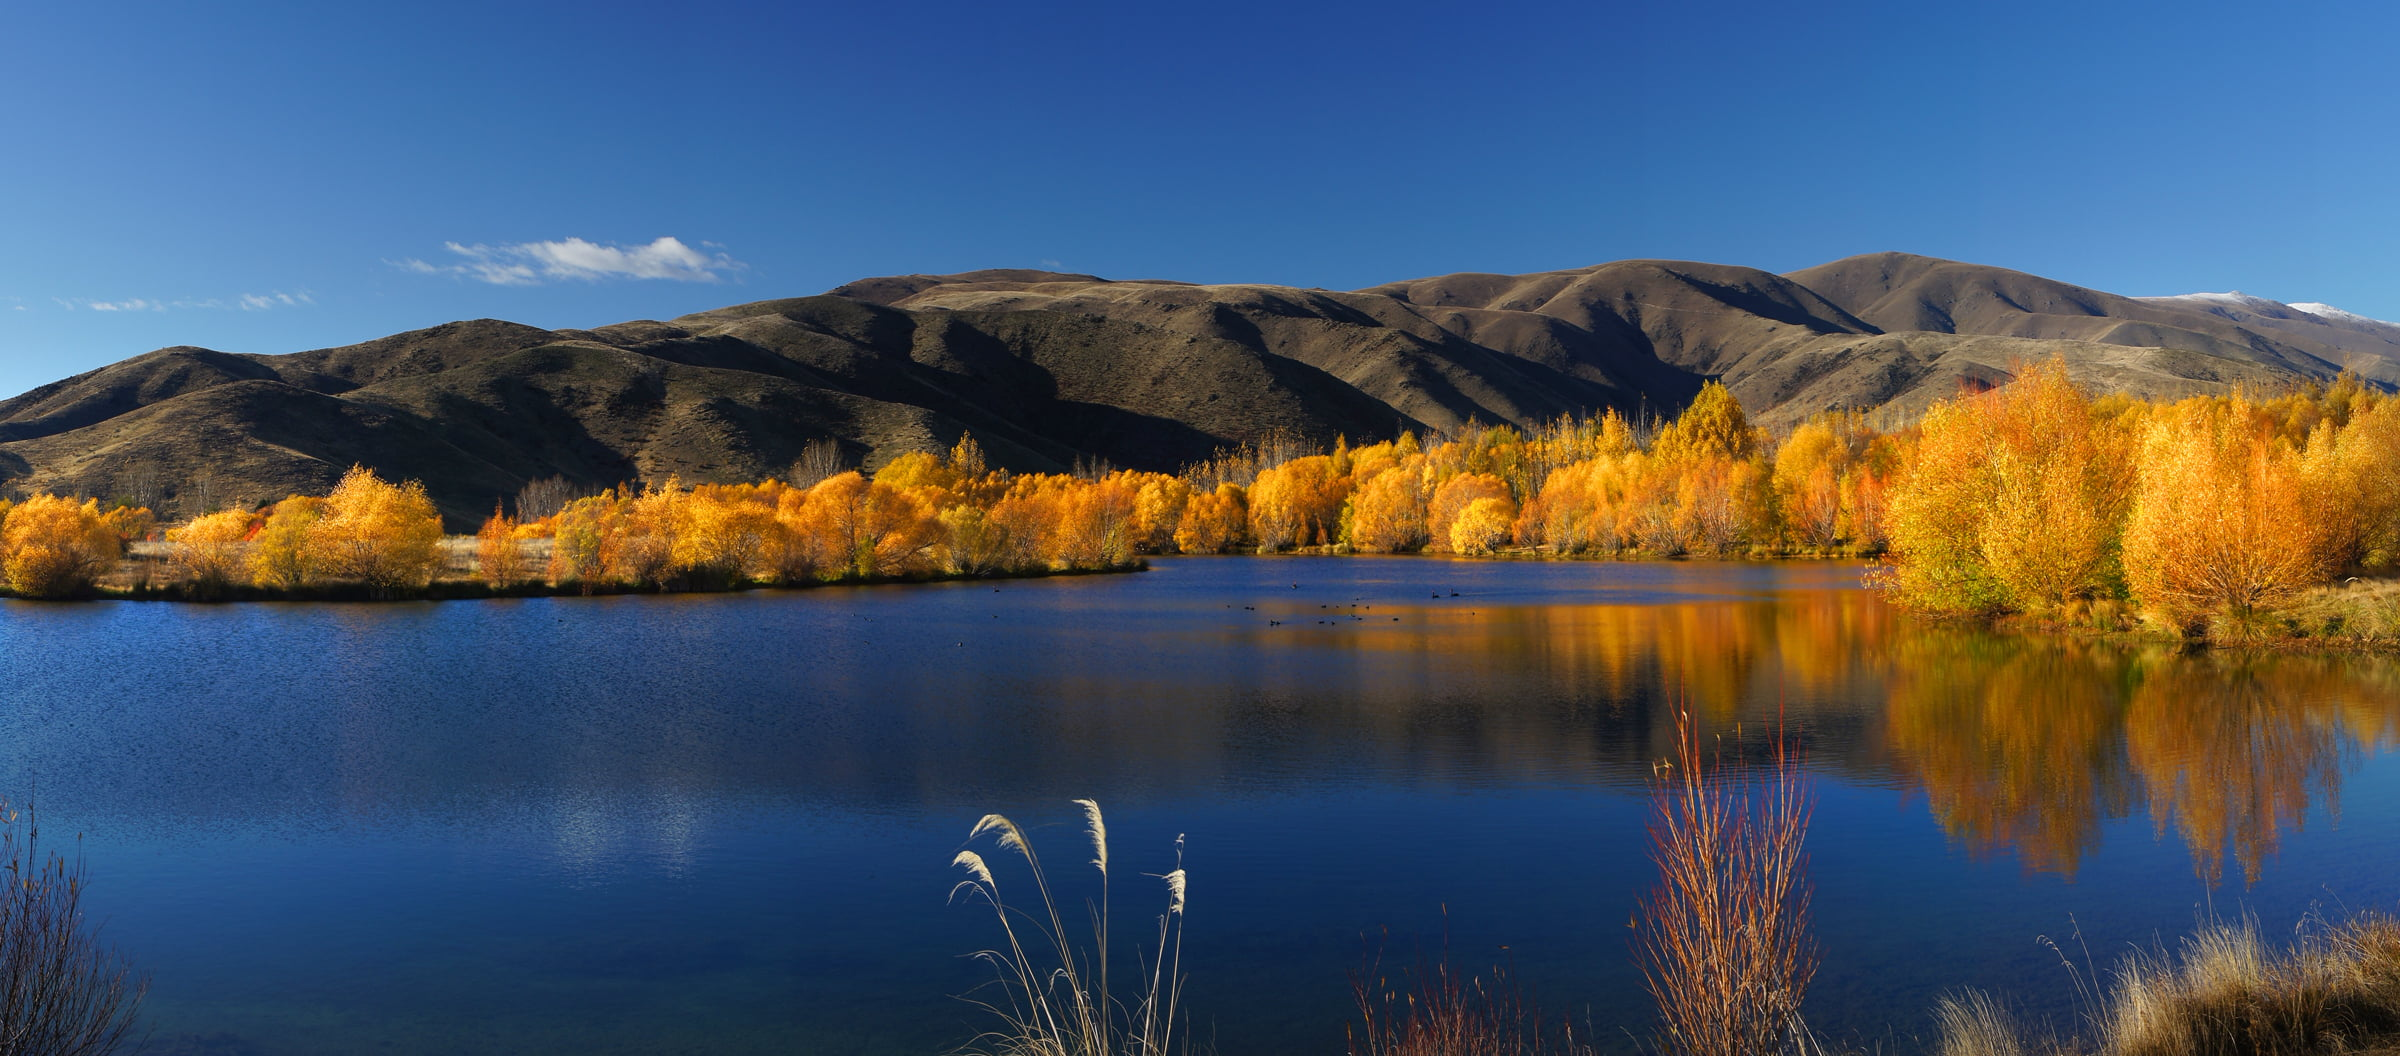 Bing Hd Wallpaper Fall Yellow Trees Near Mountain Near Body Of Water During